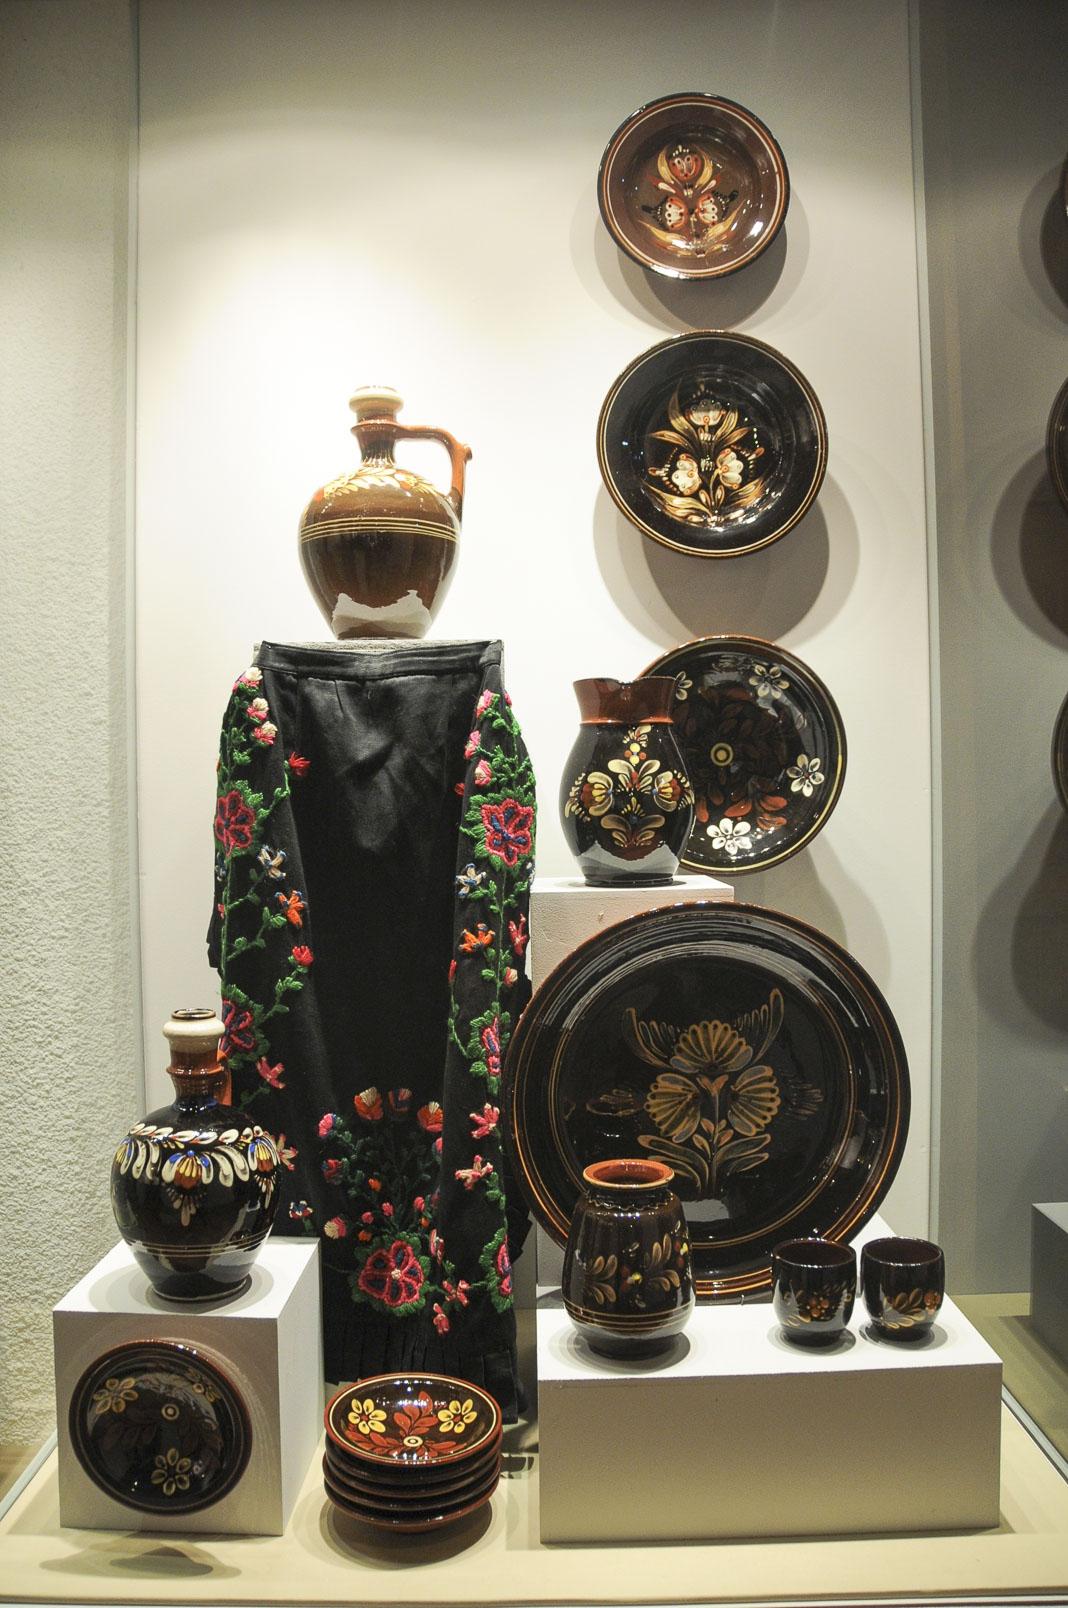 troyan-museum-cvetqta-na-zografa-22